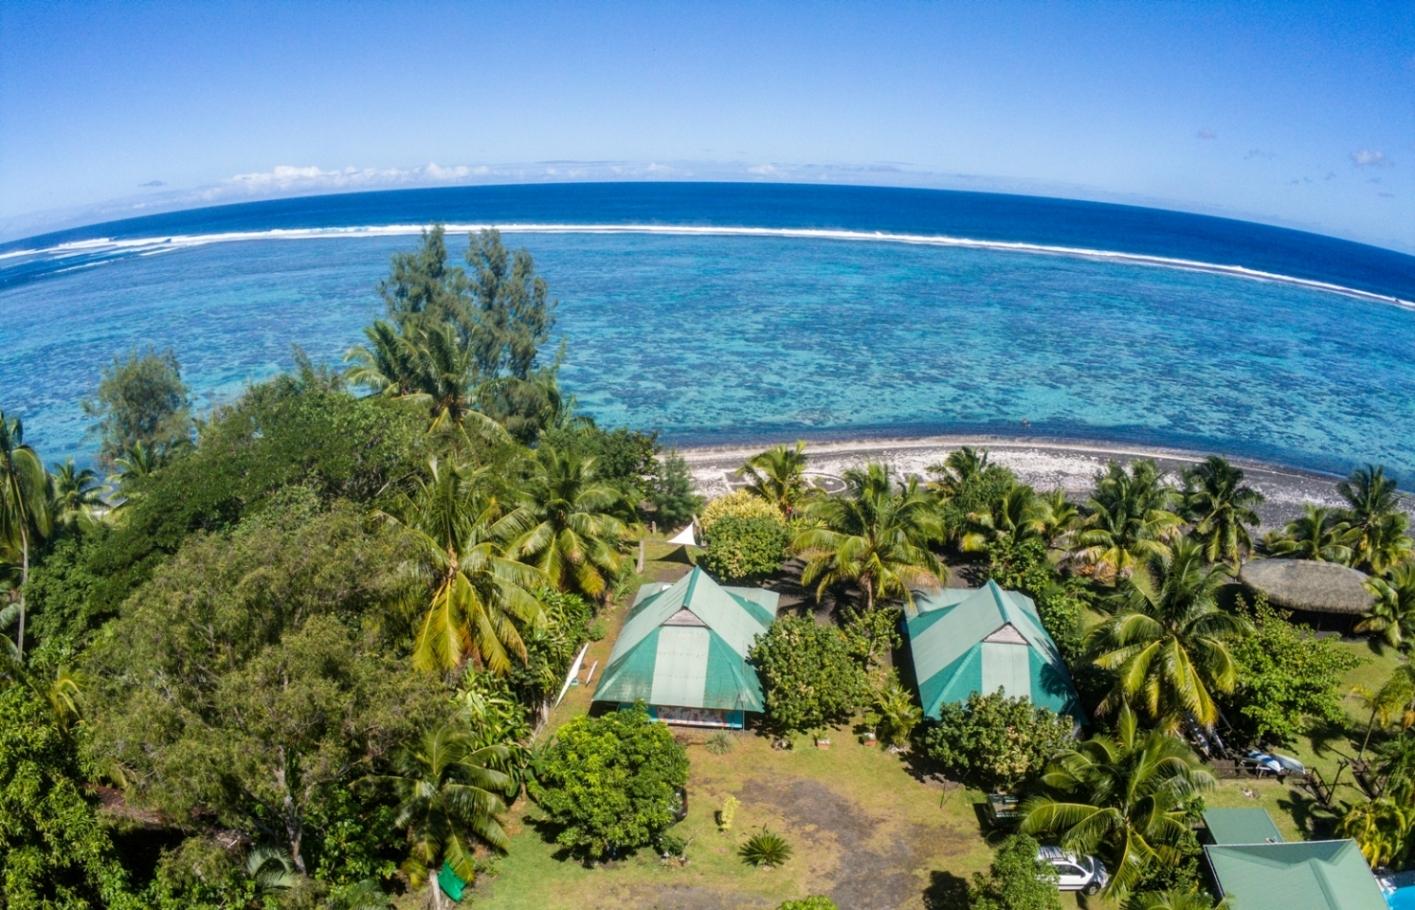 https://tahititourisme.uk/wp-content/uploads/2019/08/copie-Tahiti-tourisme-948ko.jpg